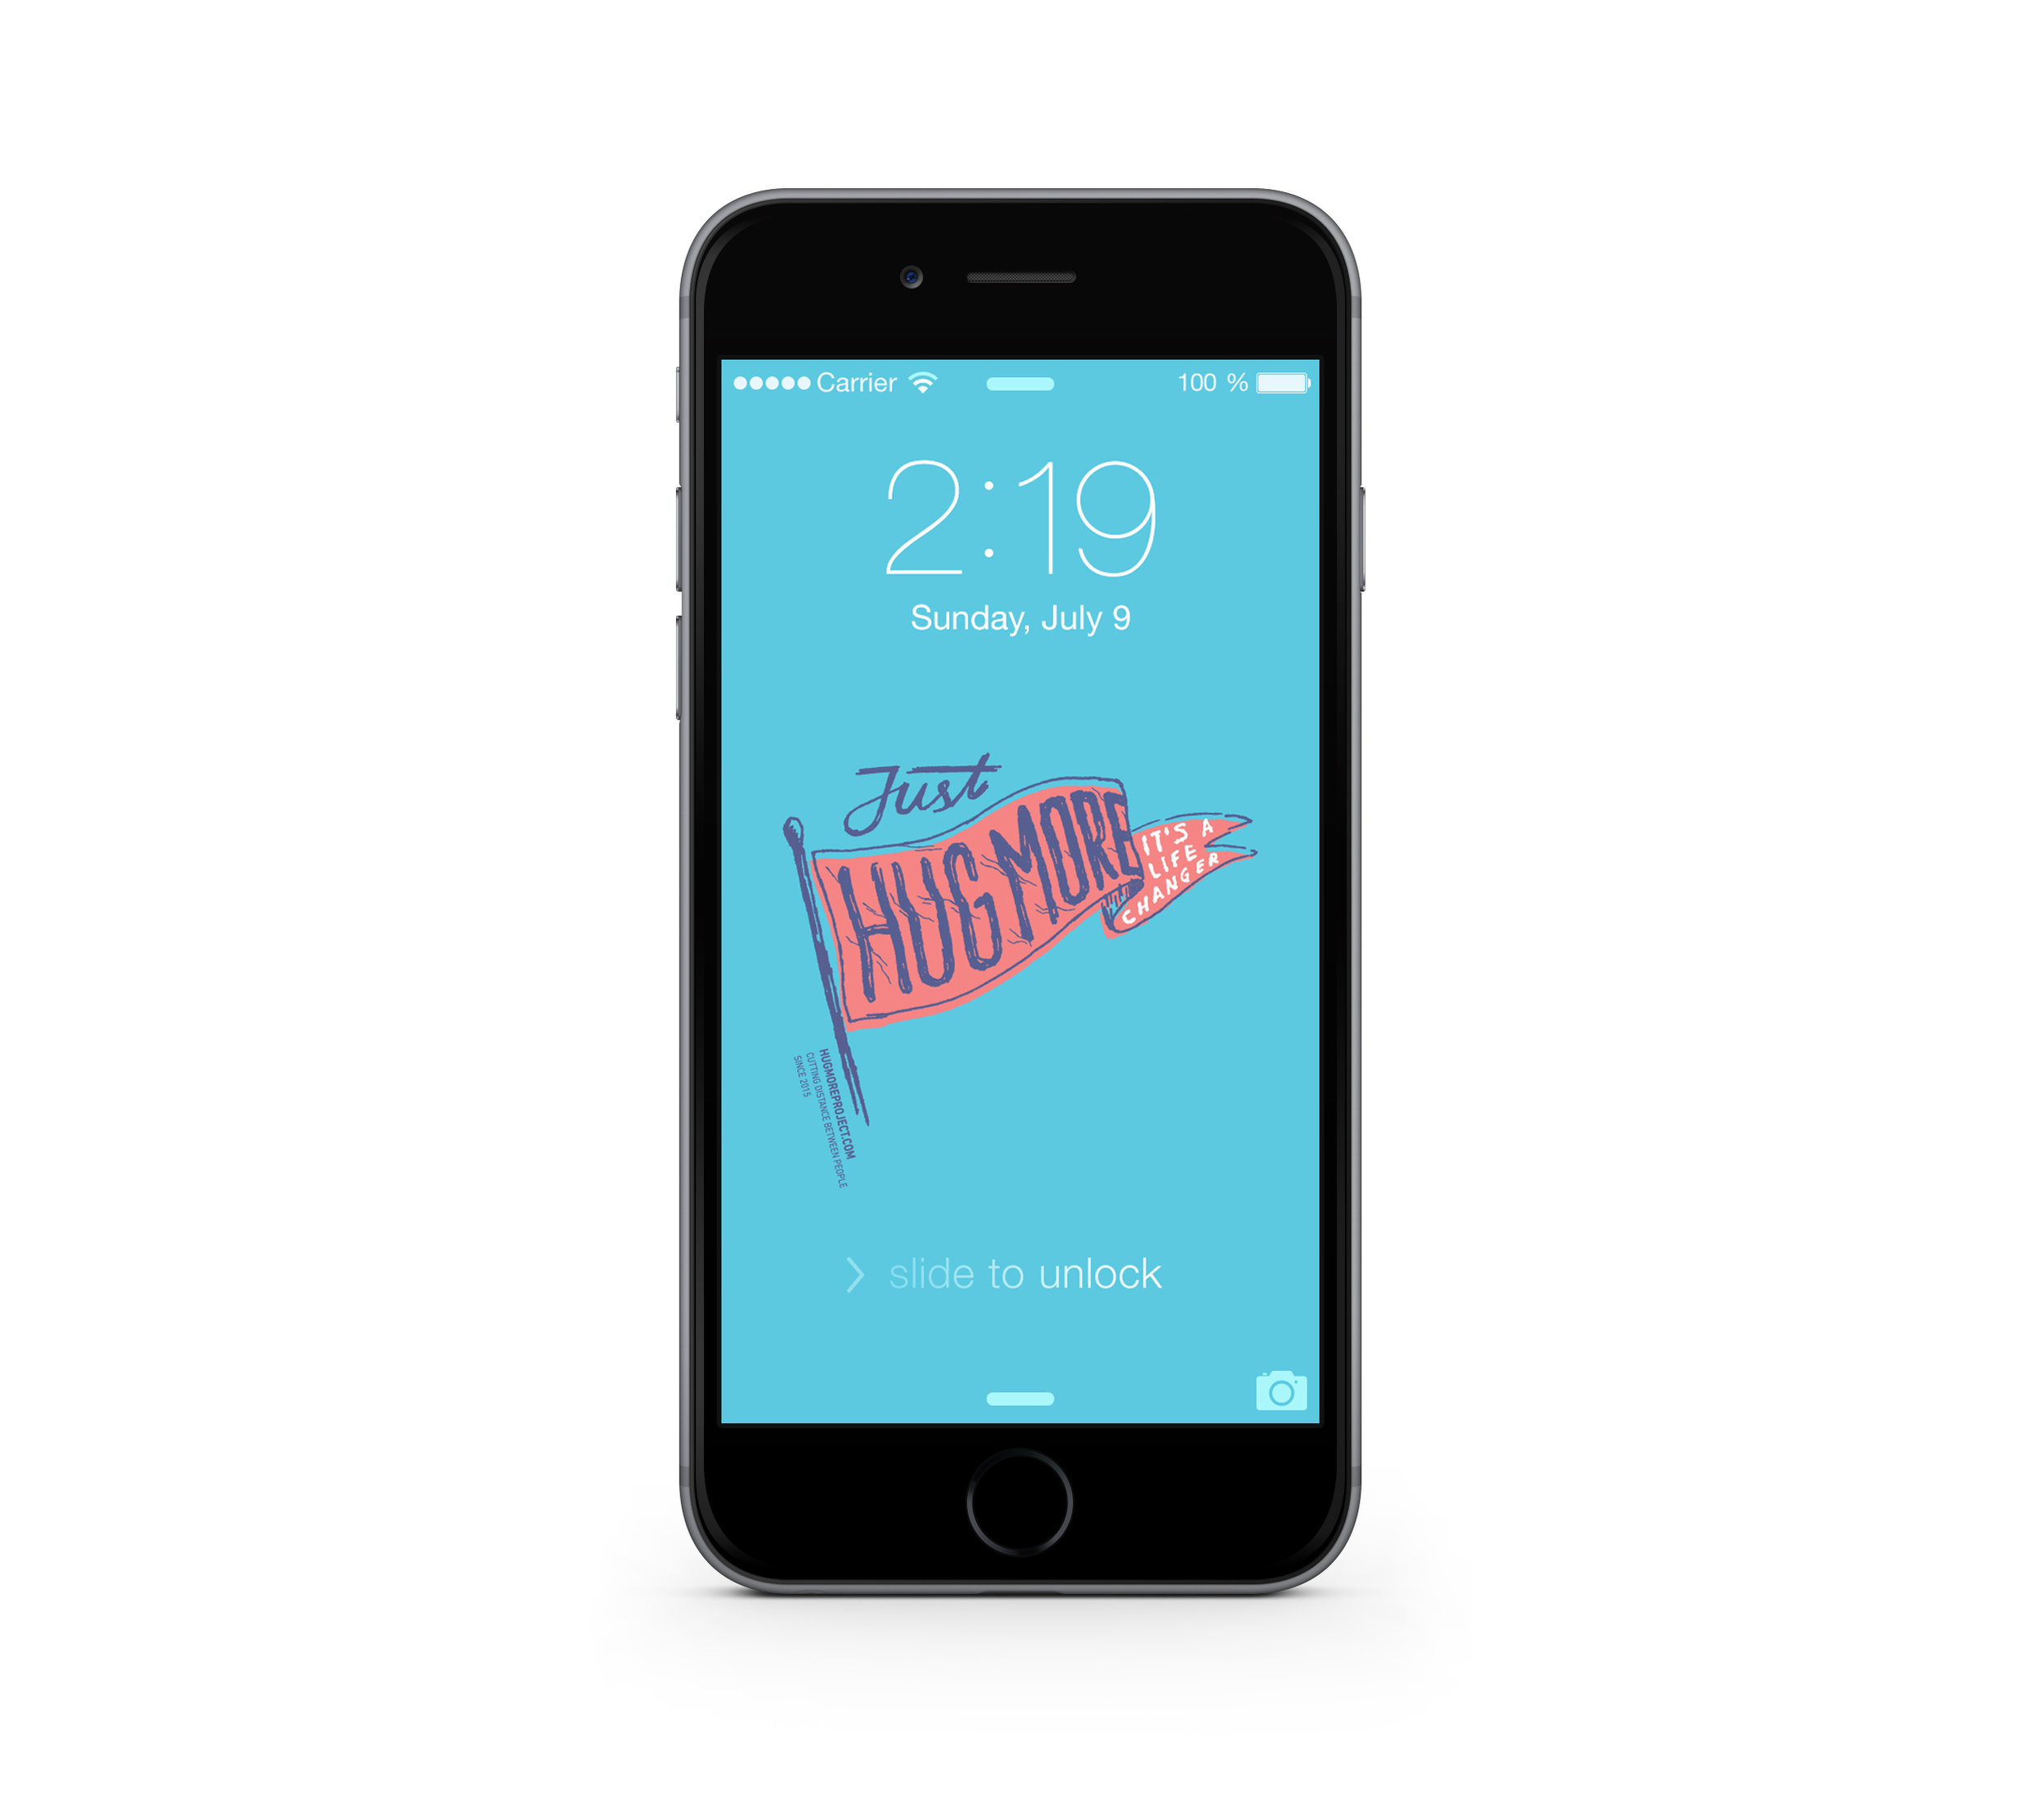 just-hug-more-typo-008-iPhone-mockup-onwhite.jpg